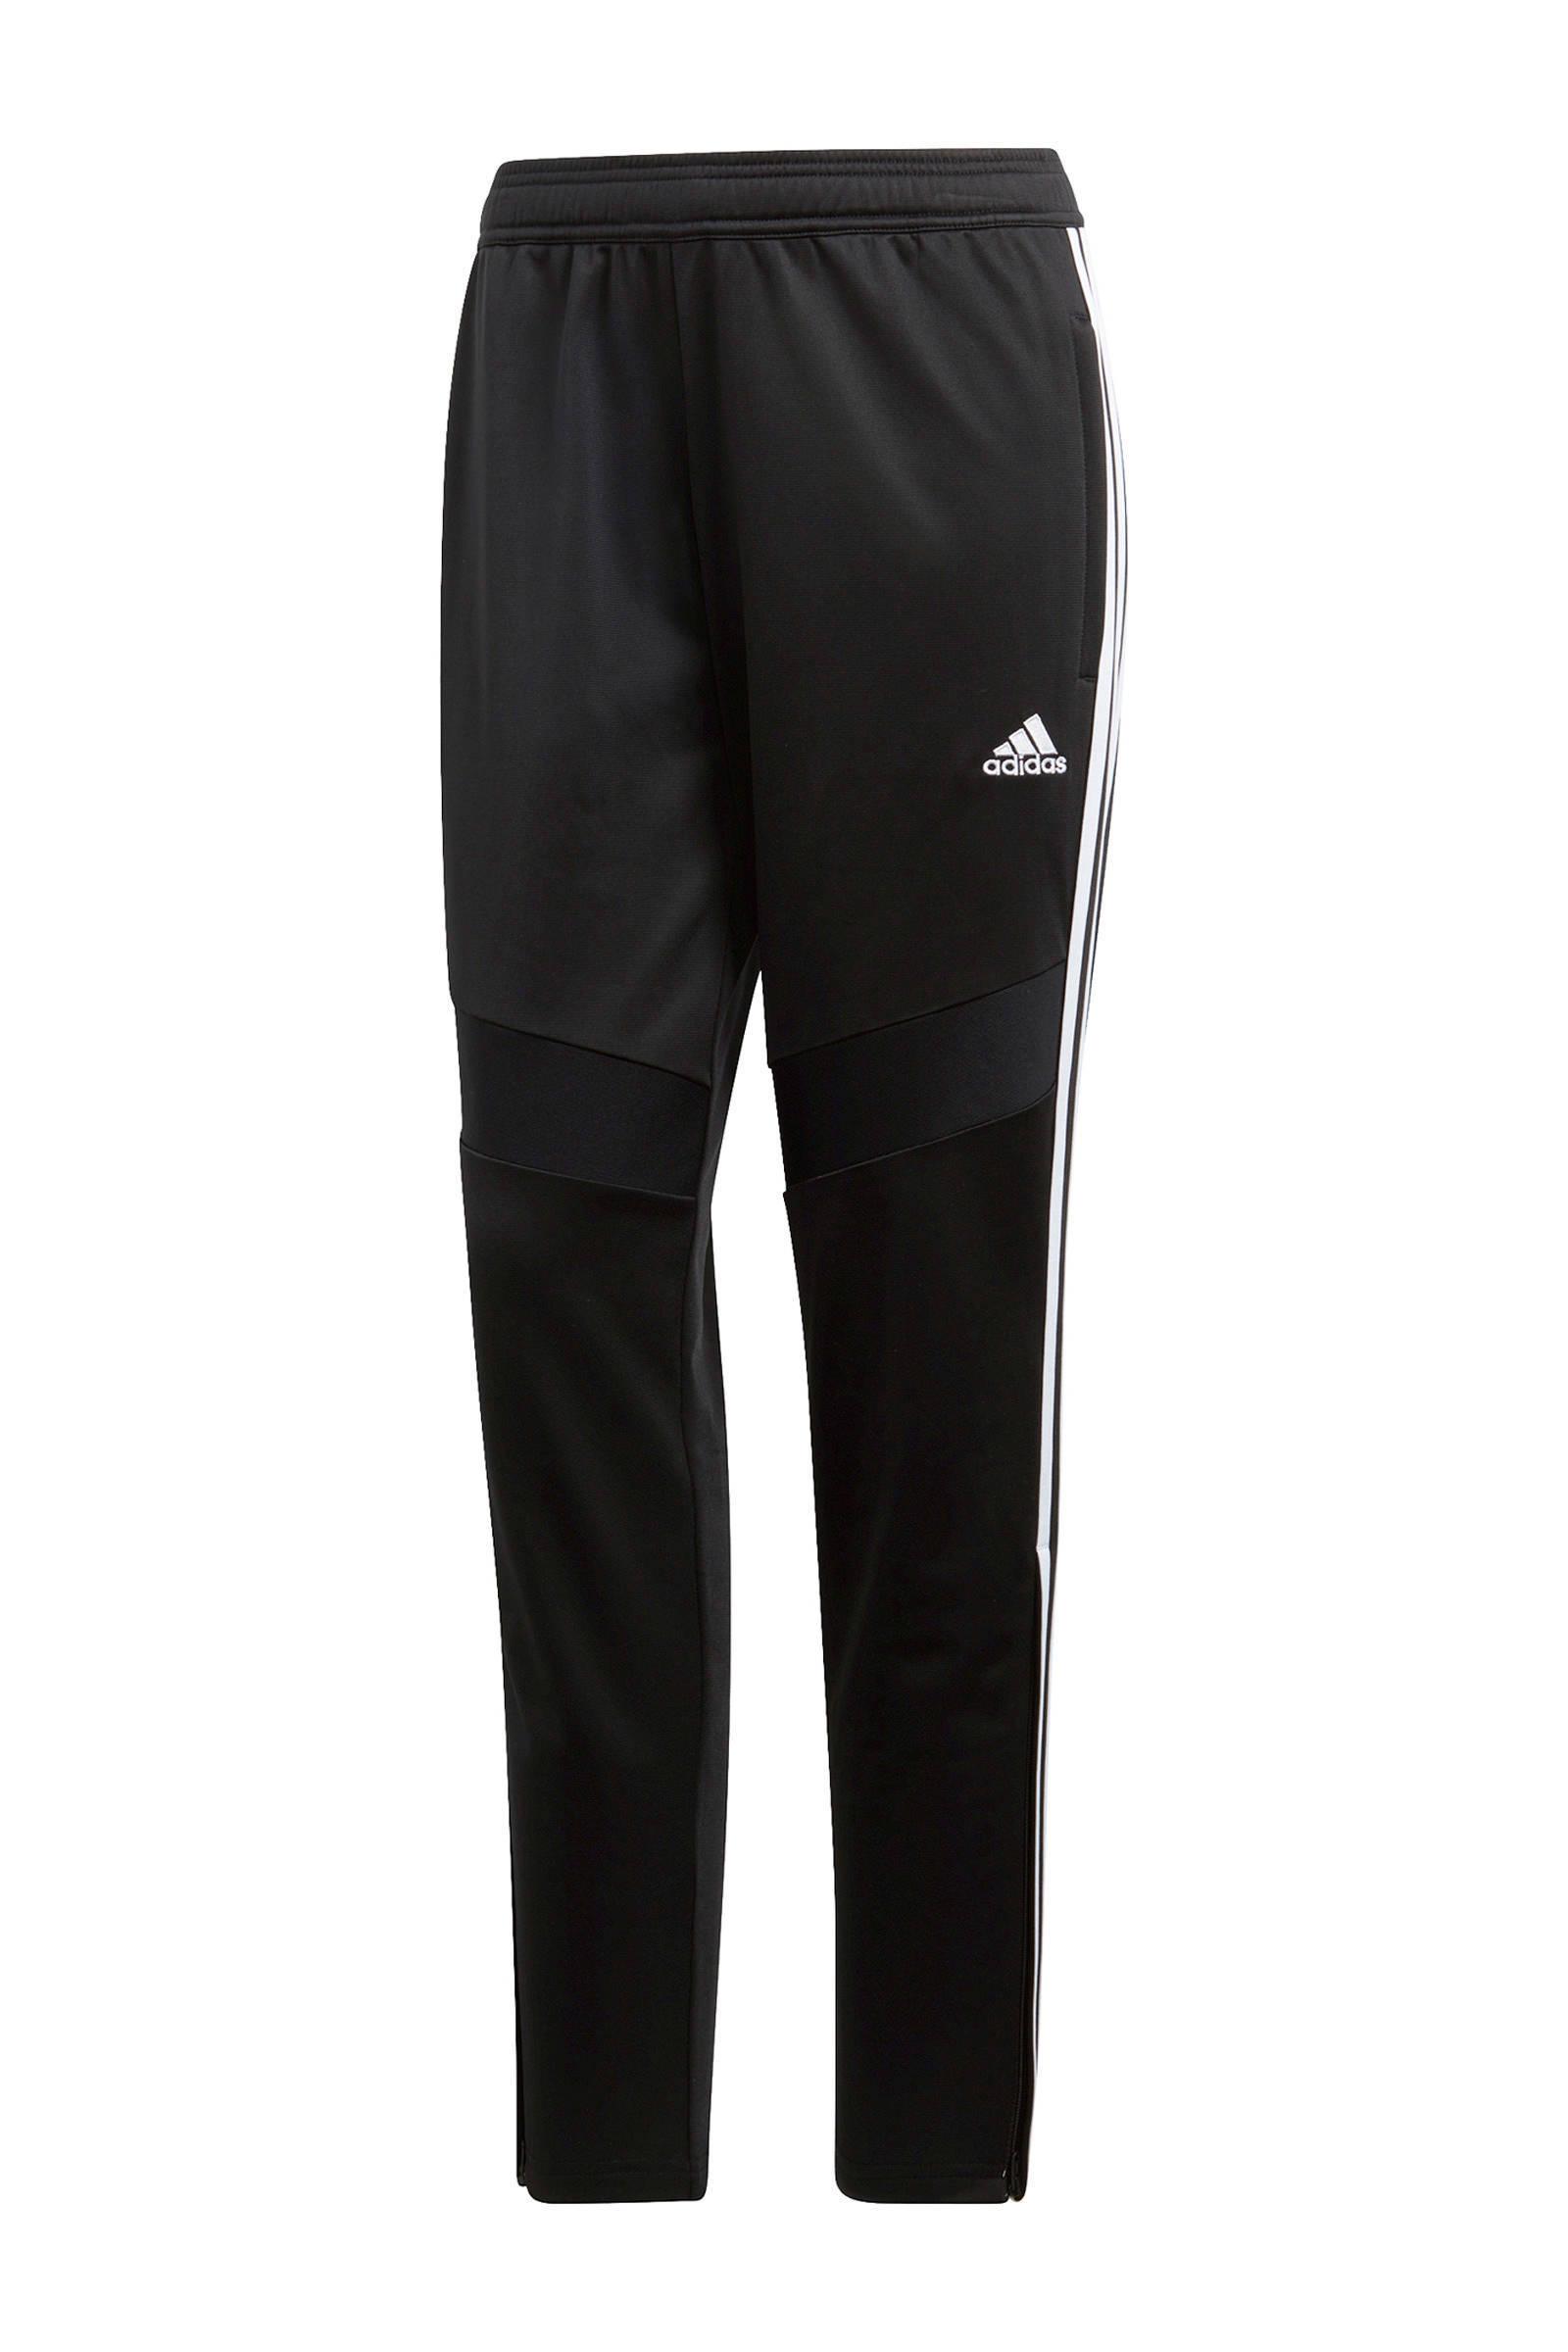 adidas Performance Tiro 19 sportbroek zwart | wehkamp